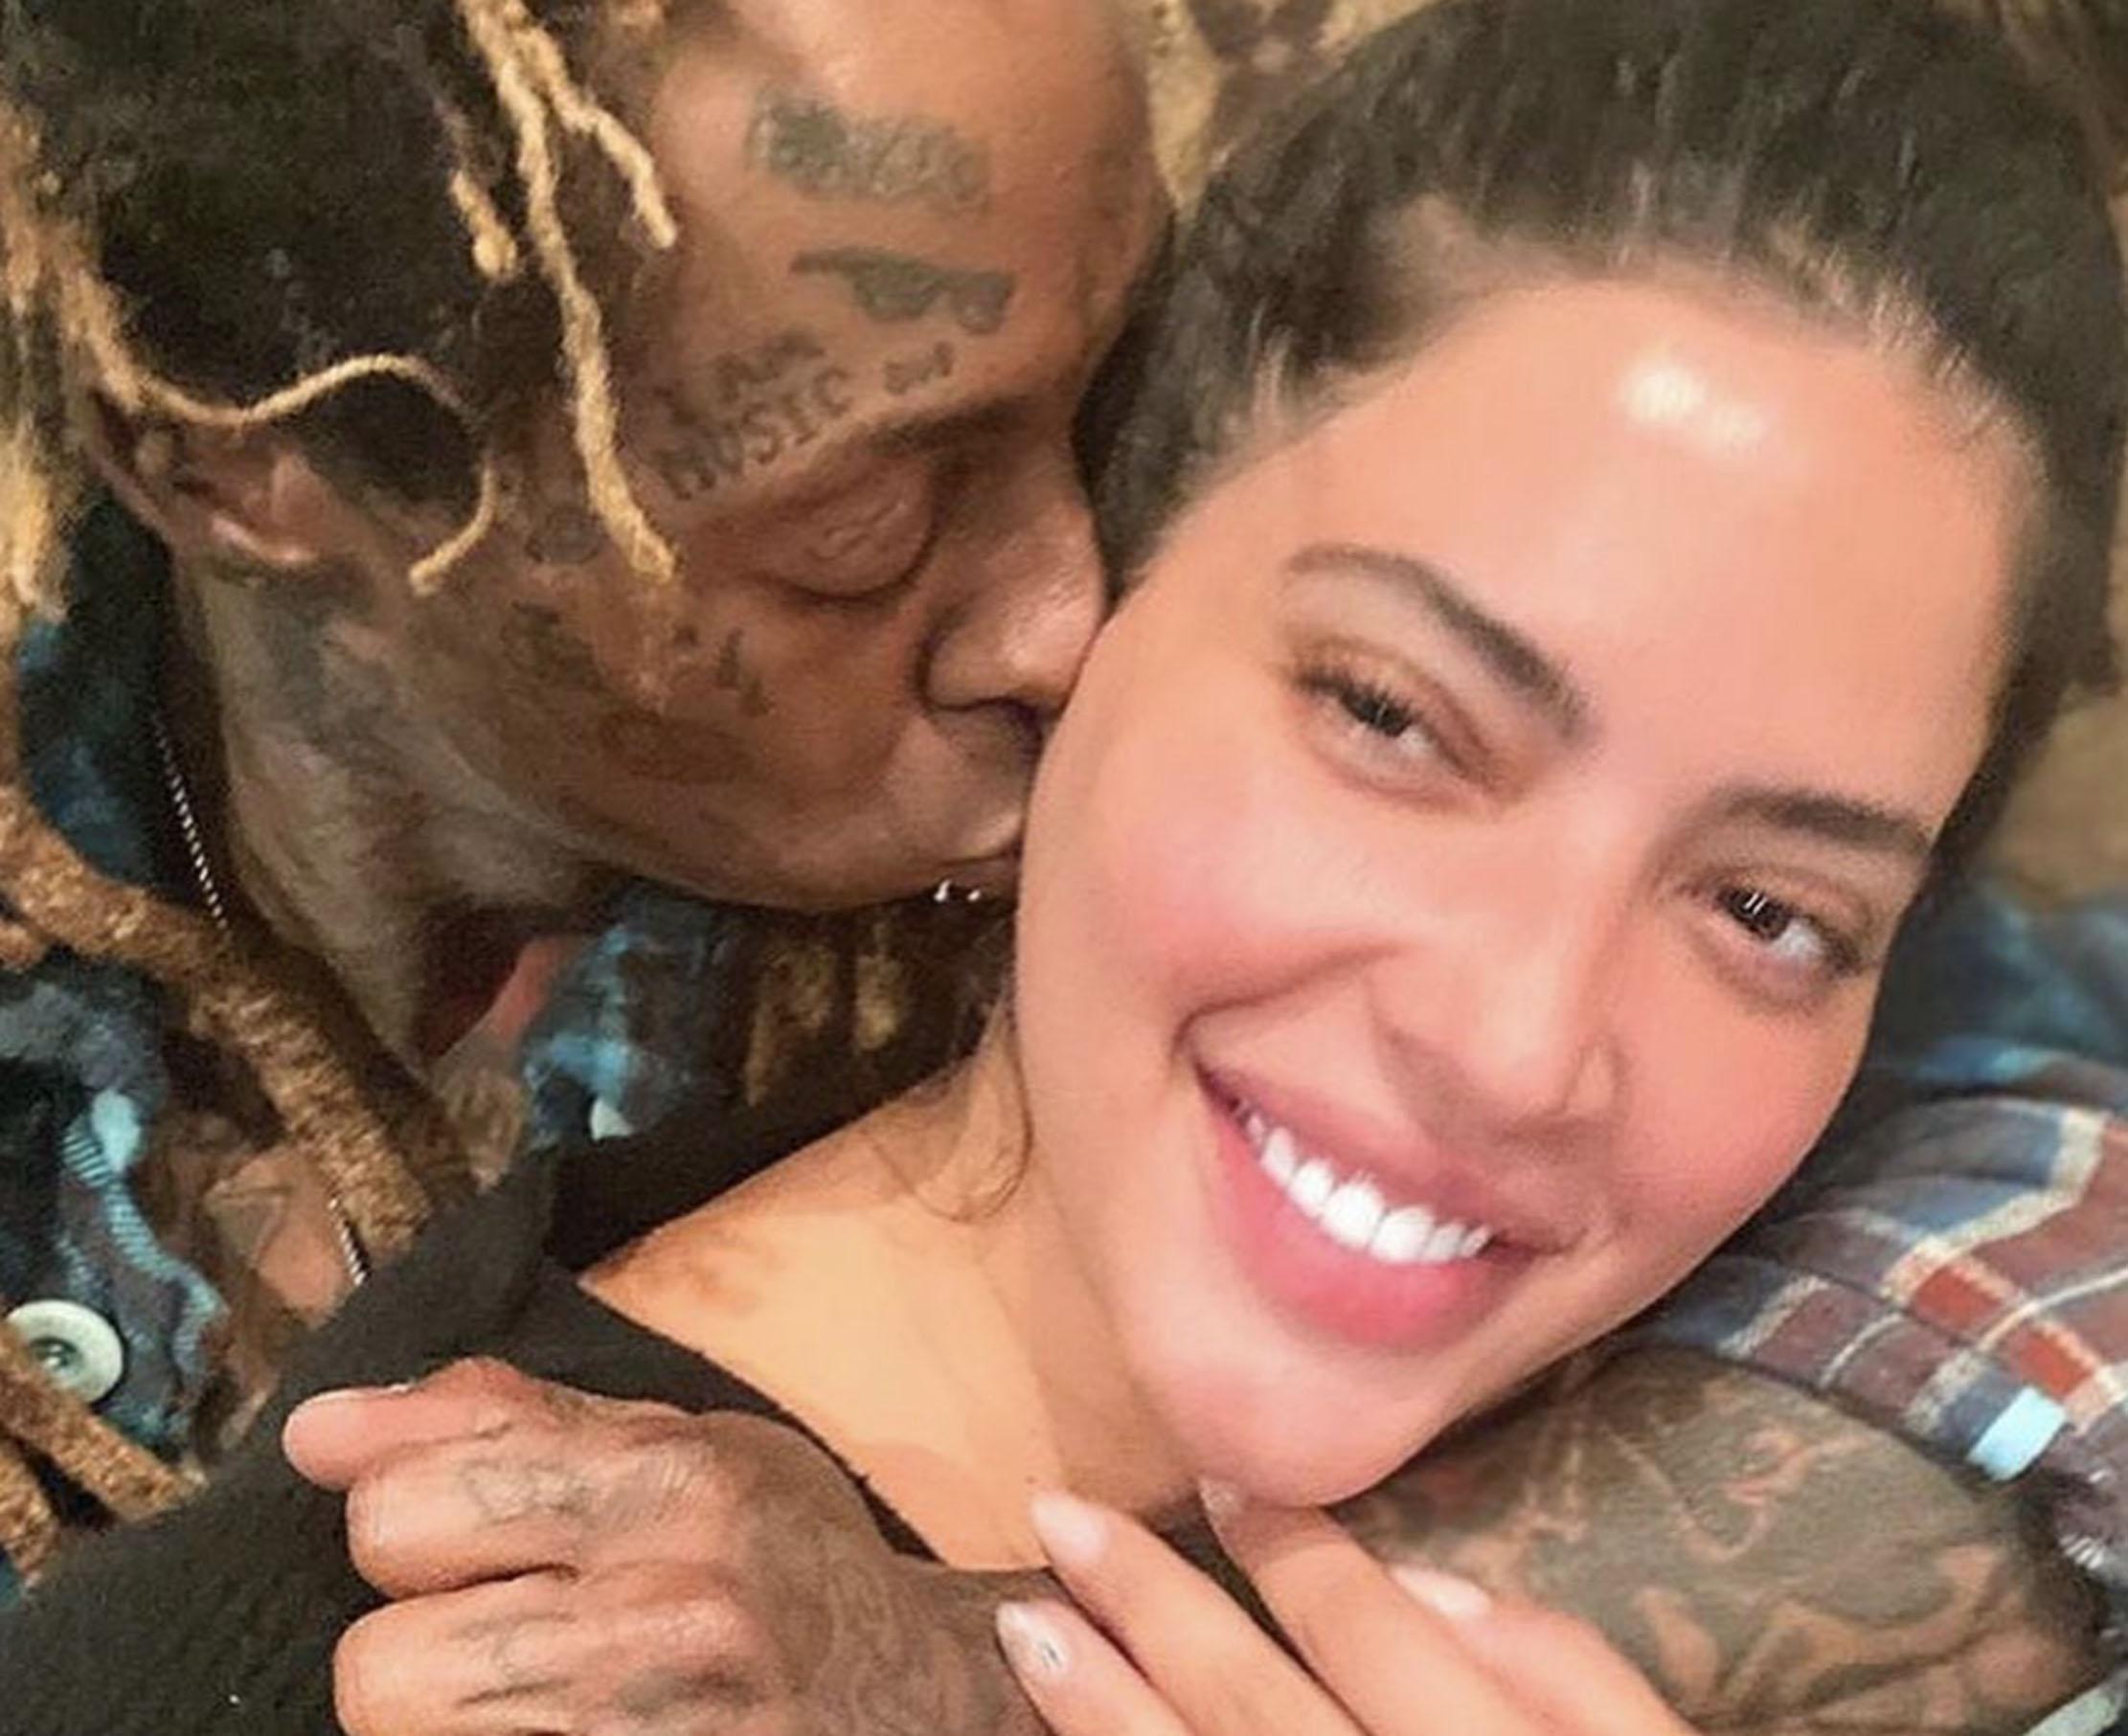 Lil Wayne og Denise Bidot i lykkeligere stunder (Instagram/liltunechi)